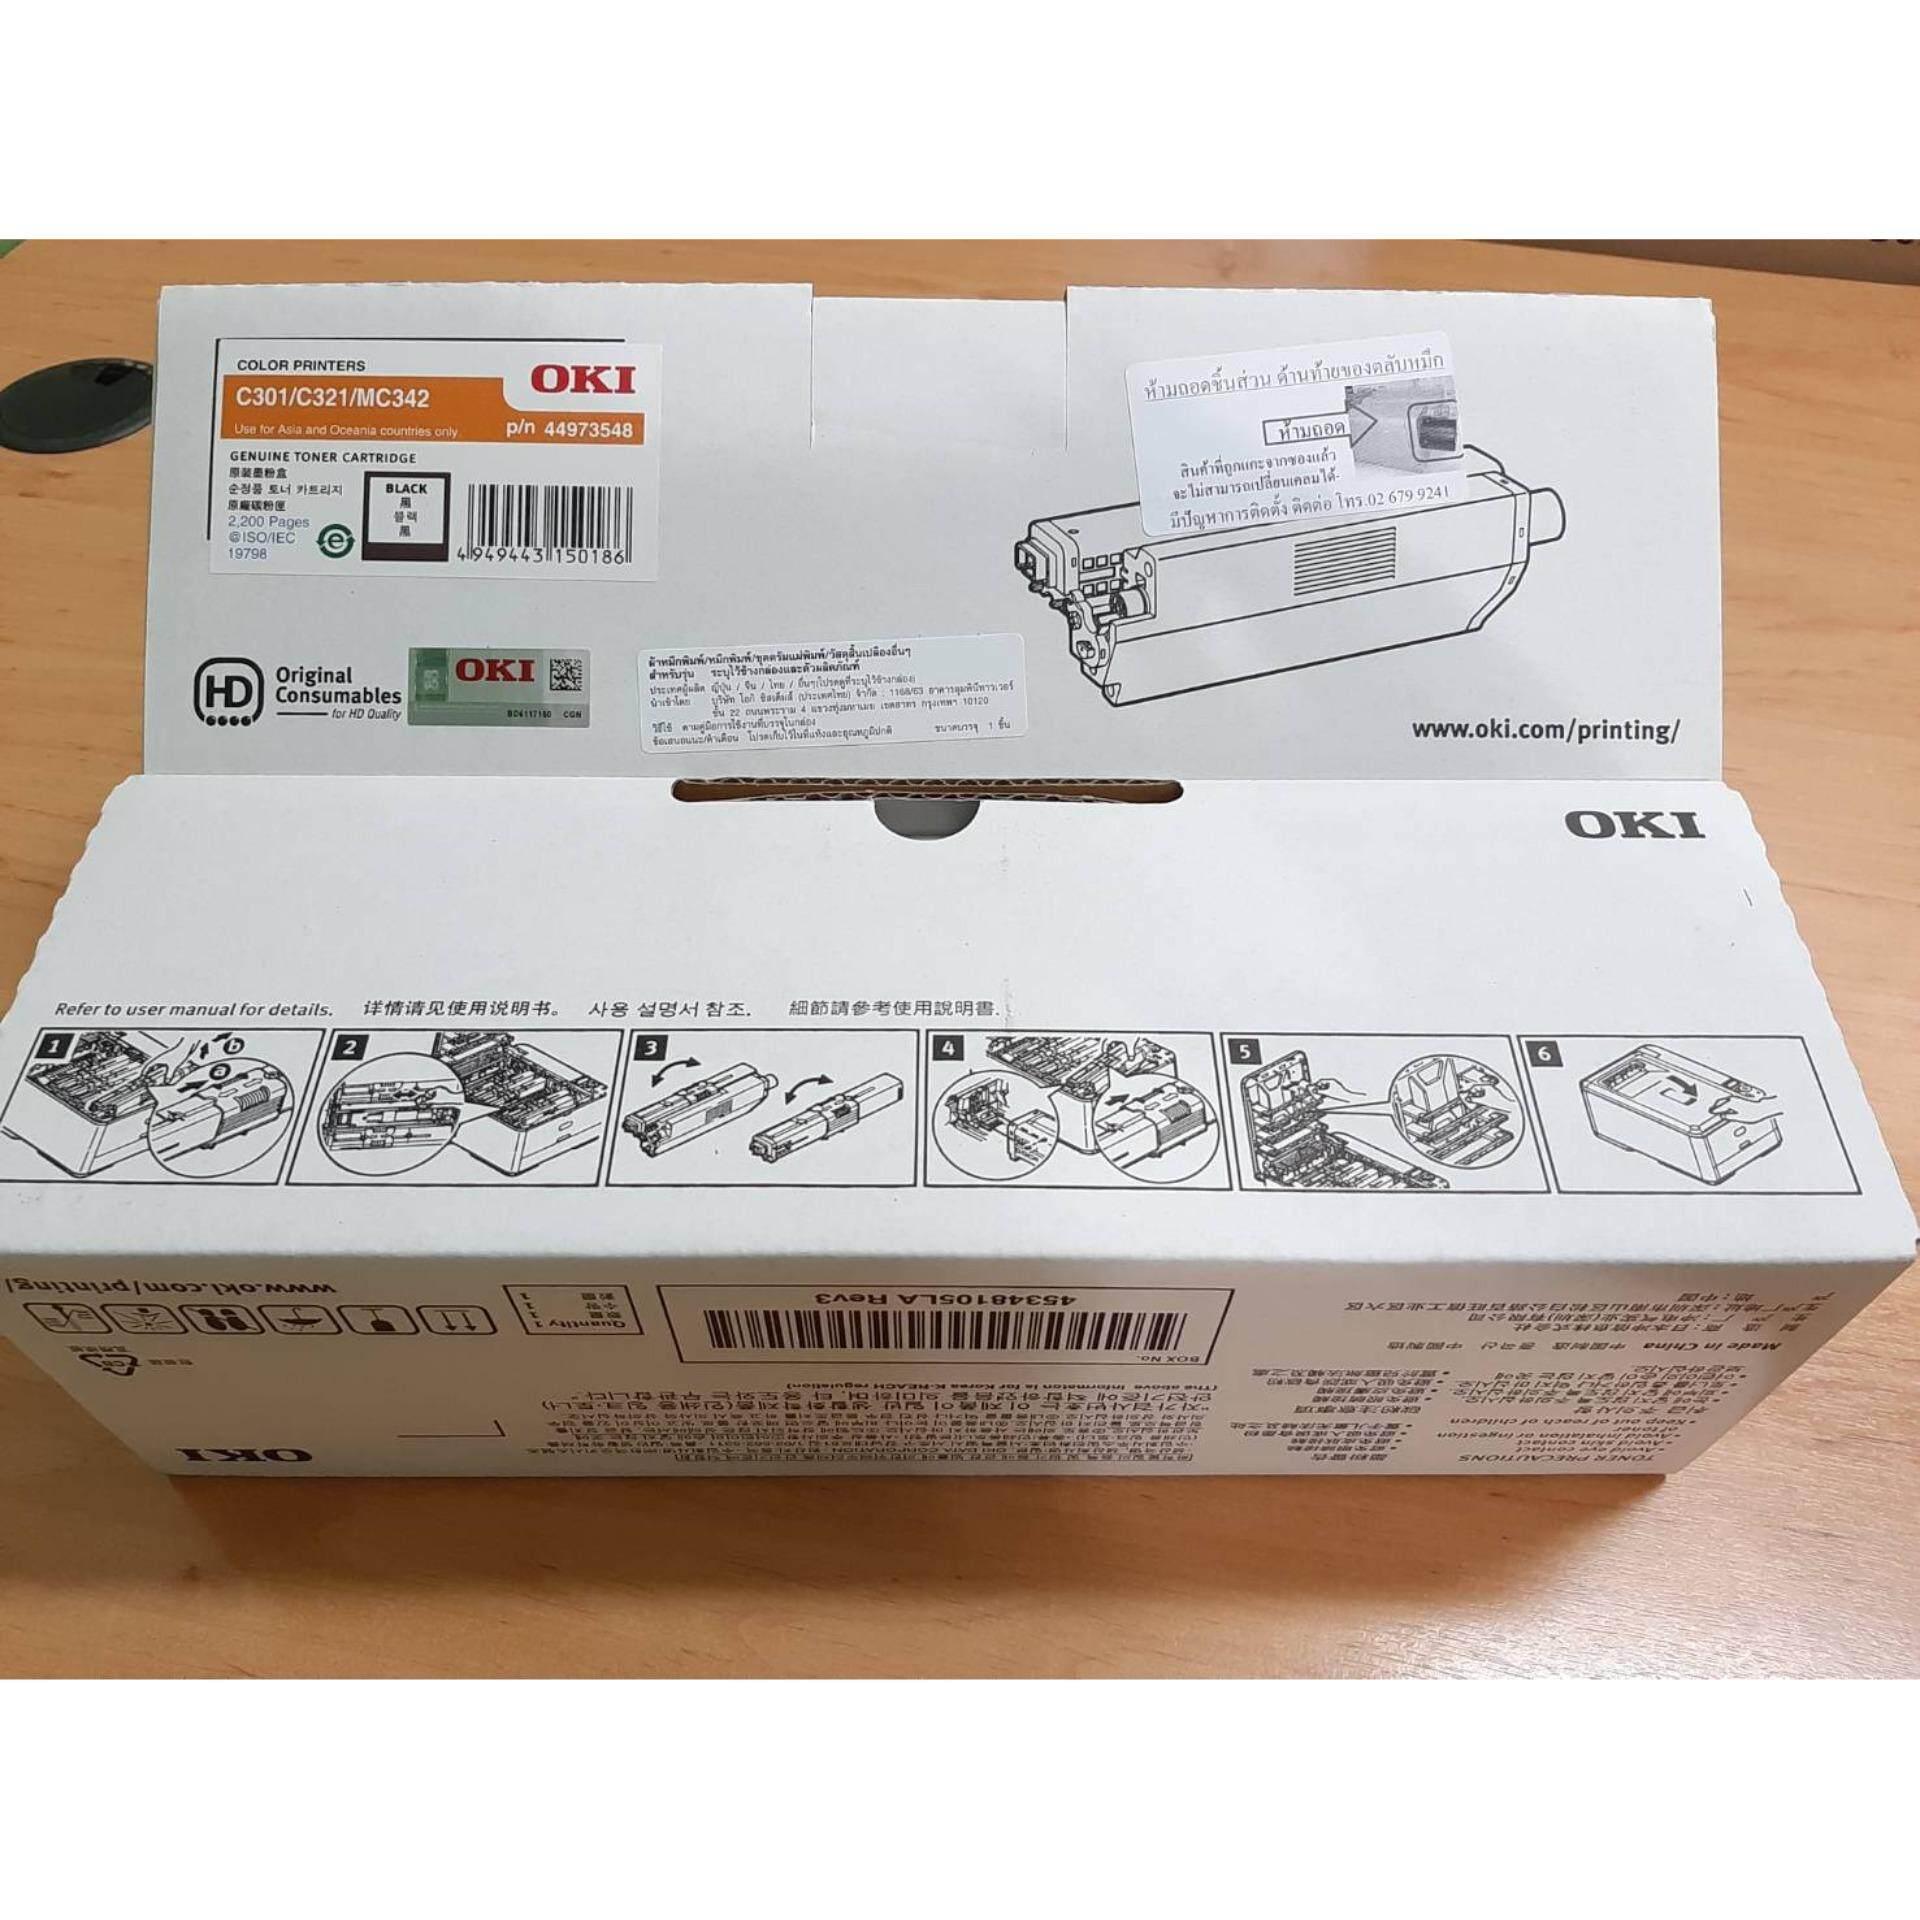 44973548 K Black Oki Genuine Toner Cartridge For C301/c321/c342 By By Mary Shop.